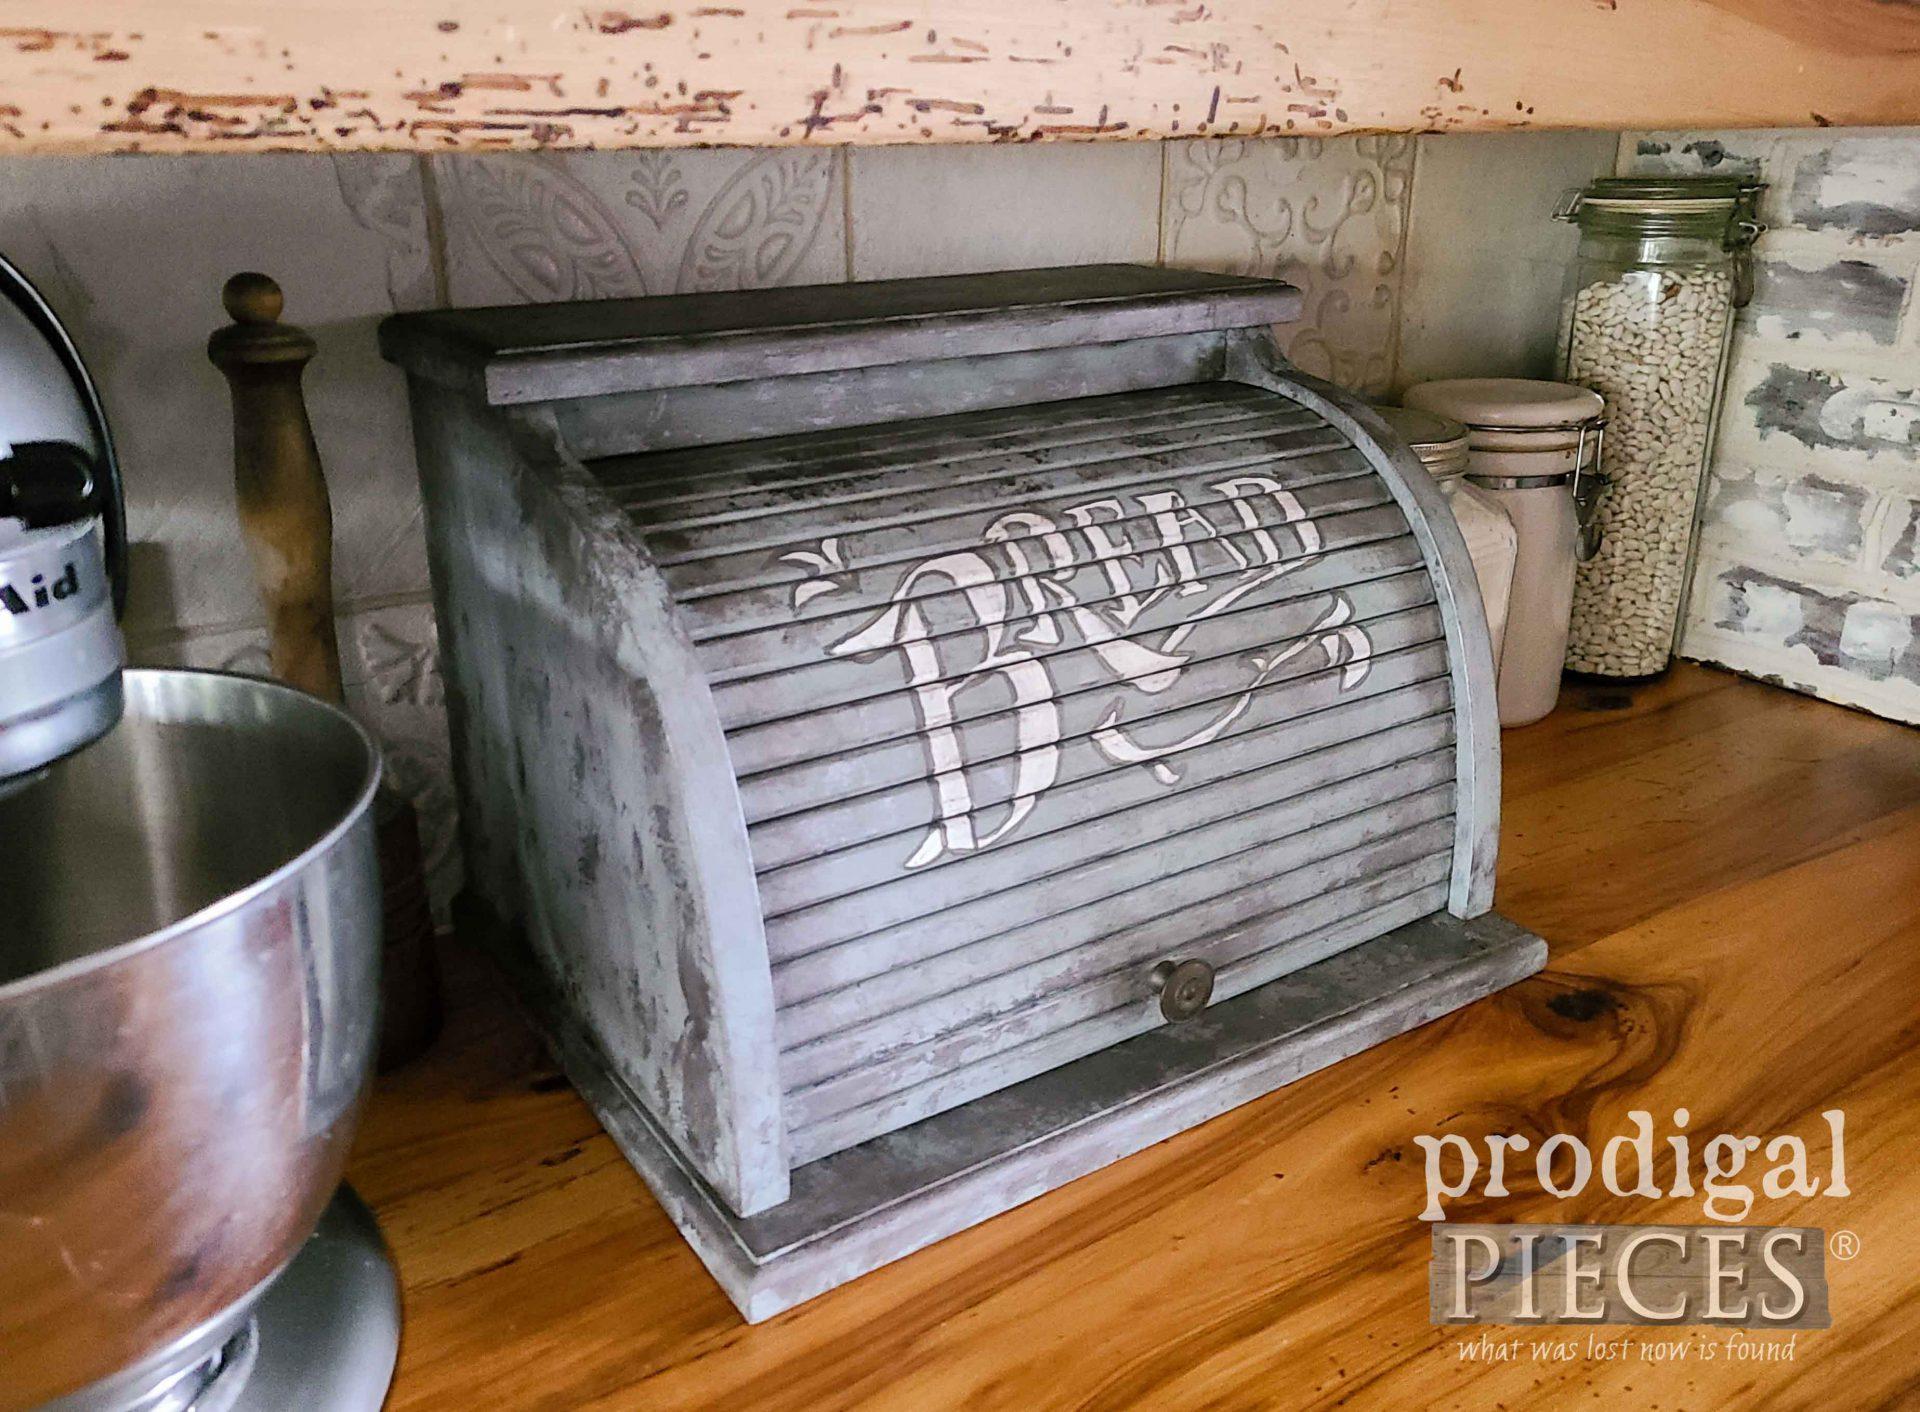 DIY Faux Zinc Makeover on Vintage Bread Box by Larissa of Prodigal Pieces | prodigalpieces.com #prodigalpieces #home #kitchen #farmhouse #diy